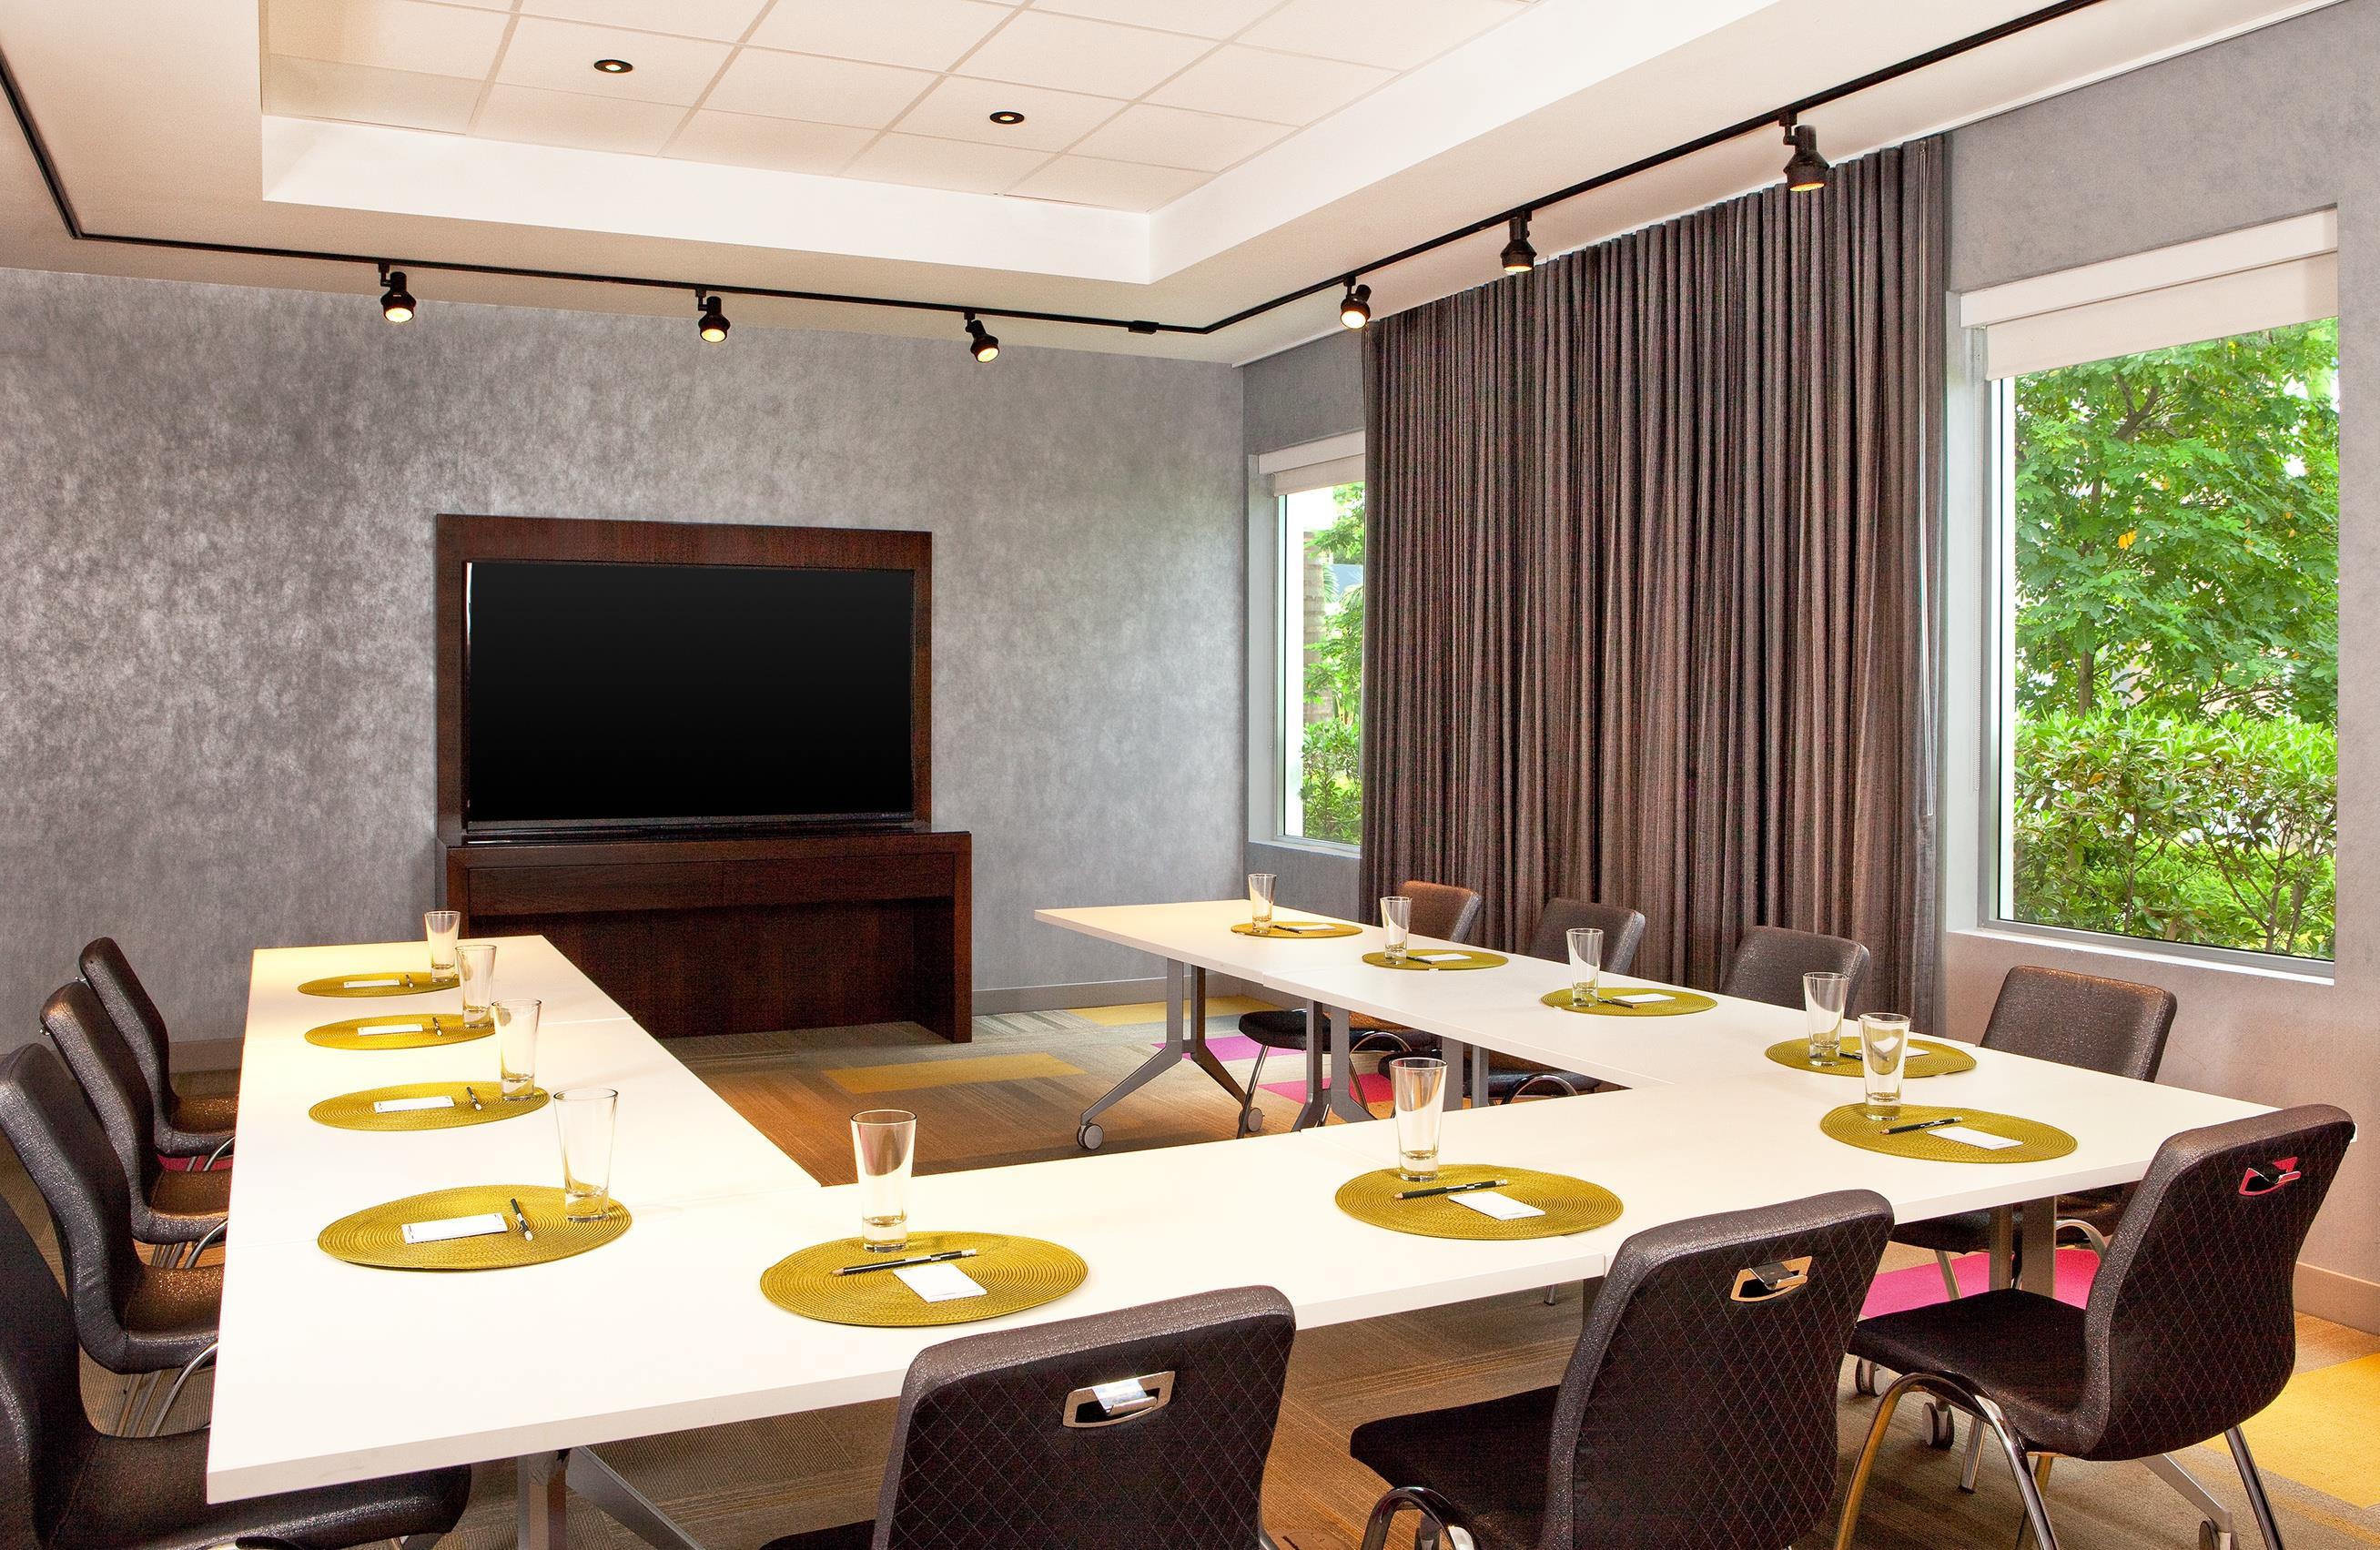 Dining Room Supervisor Jobs Employment  Indeedcom